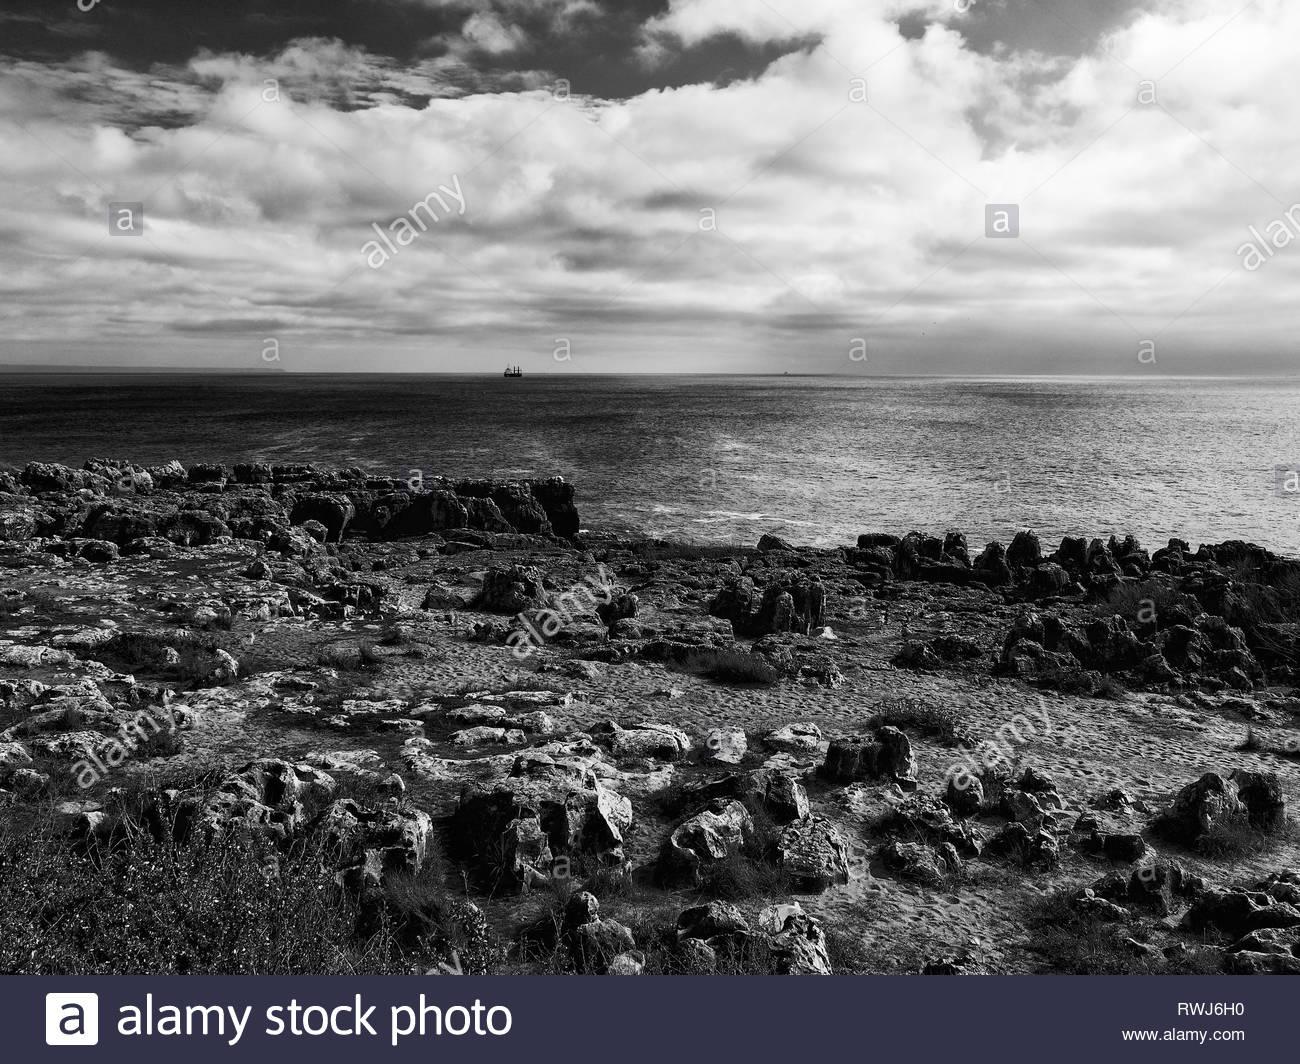 Cargo ship anchored off-shore, B&W black and white, Cascais, Portugal - Stock Image